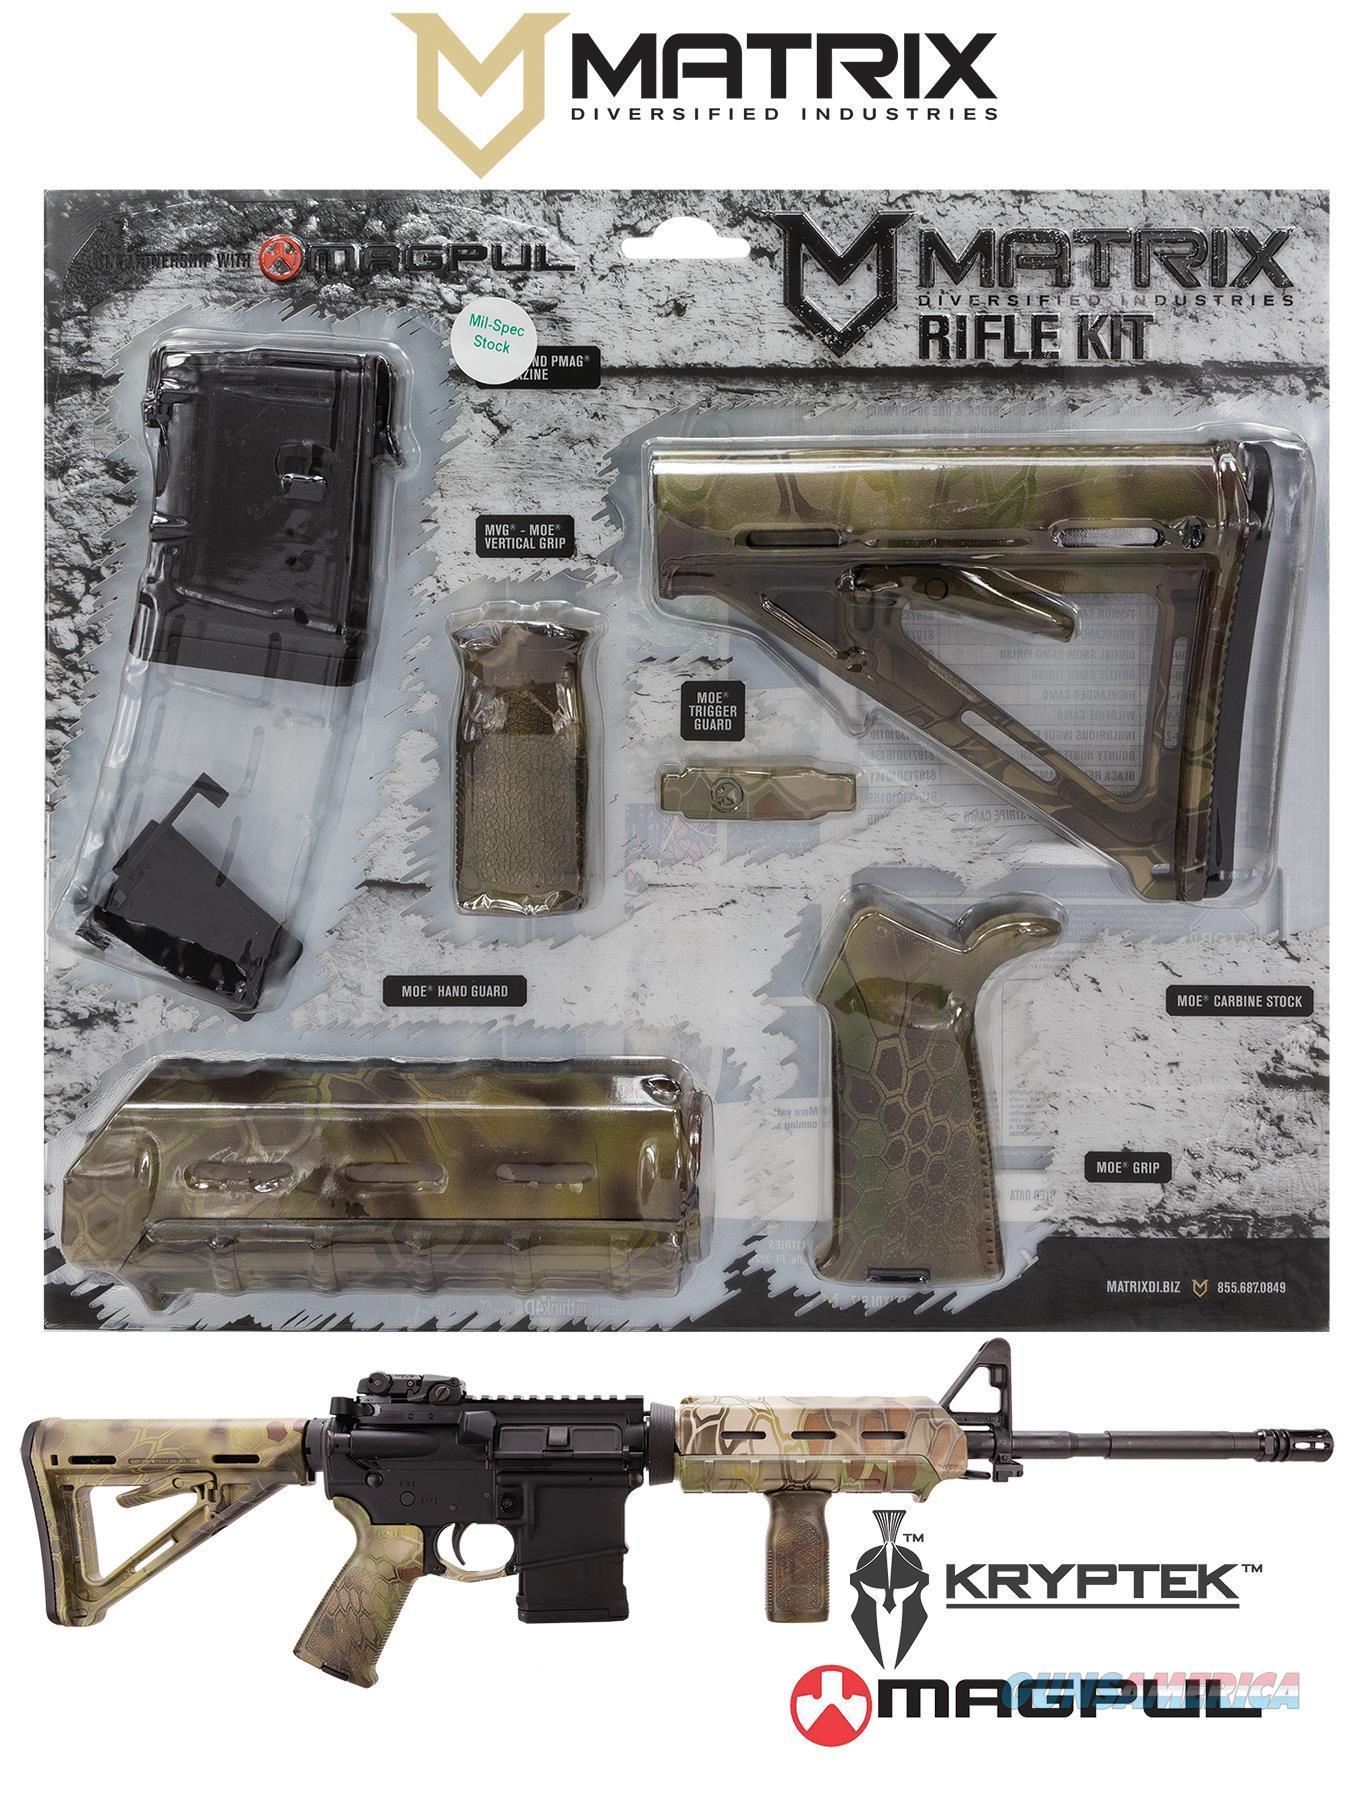 Mdi Magcom61-Km Kryptek Mandrake 10Rd Magpul Moe Kit MAGCOM61KM  Non-Guns > Gunstocks, Grips & Wood